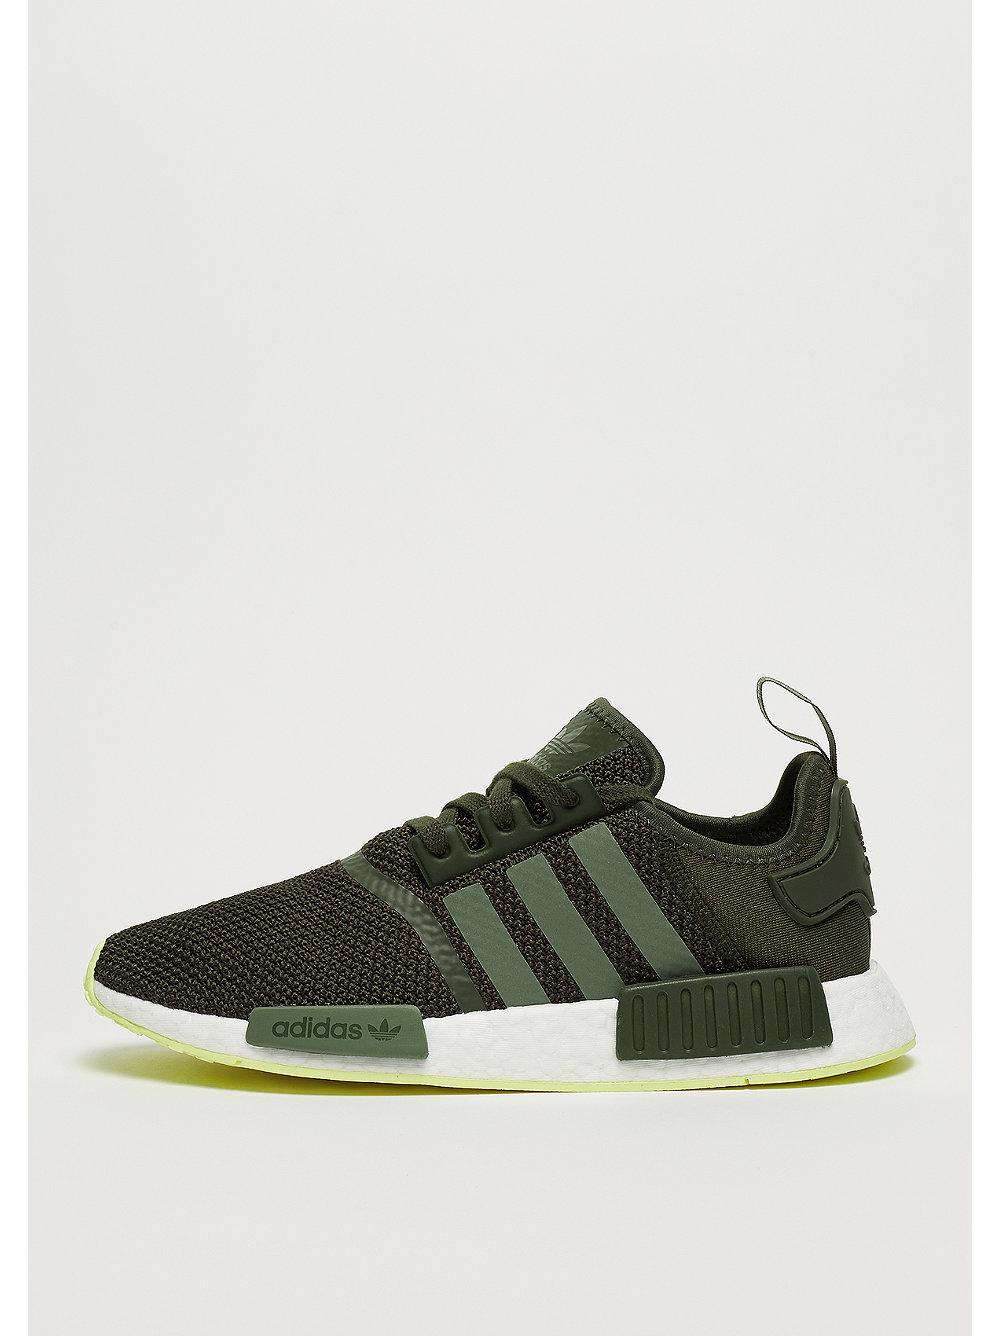 adidas nmd r1 dames green